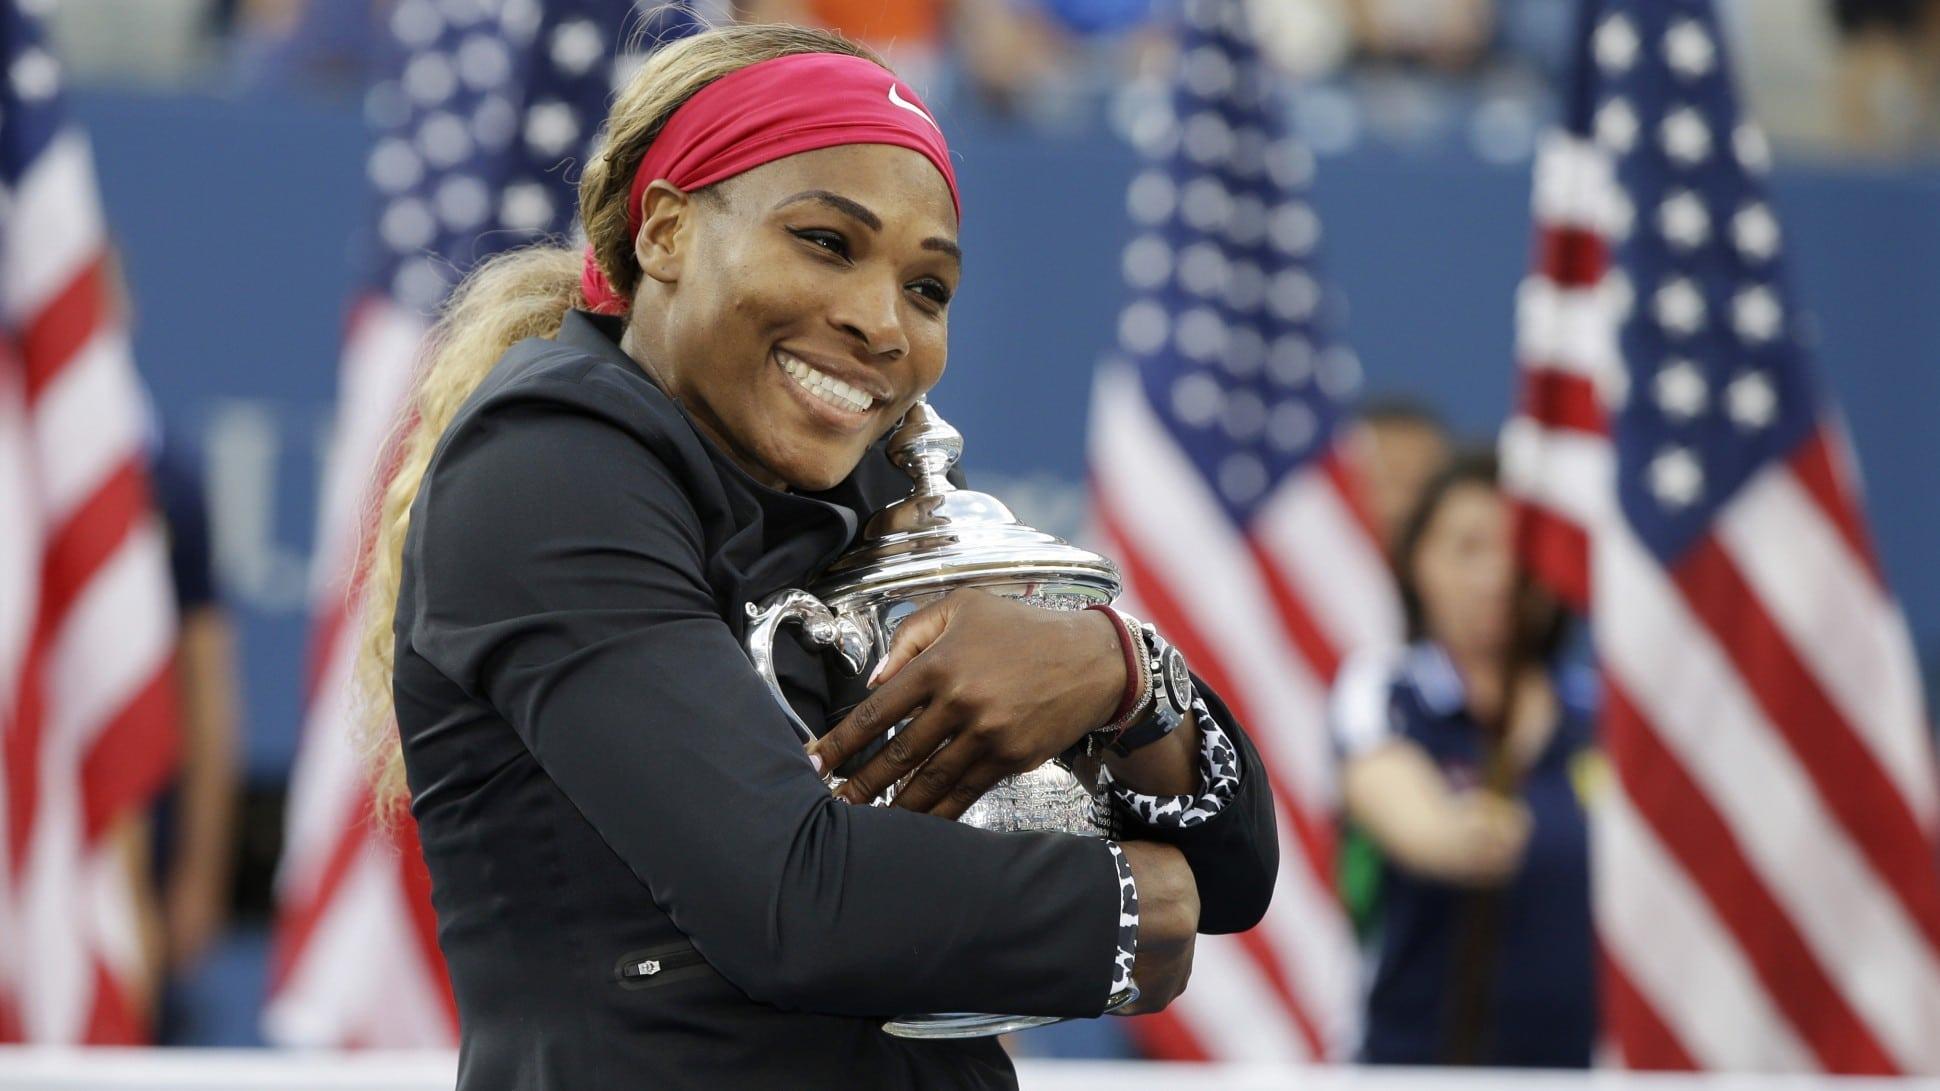 Serena Williams hexacampeão do US Open